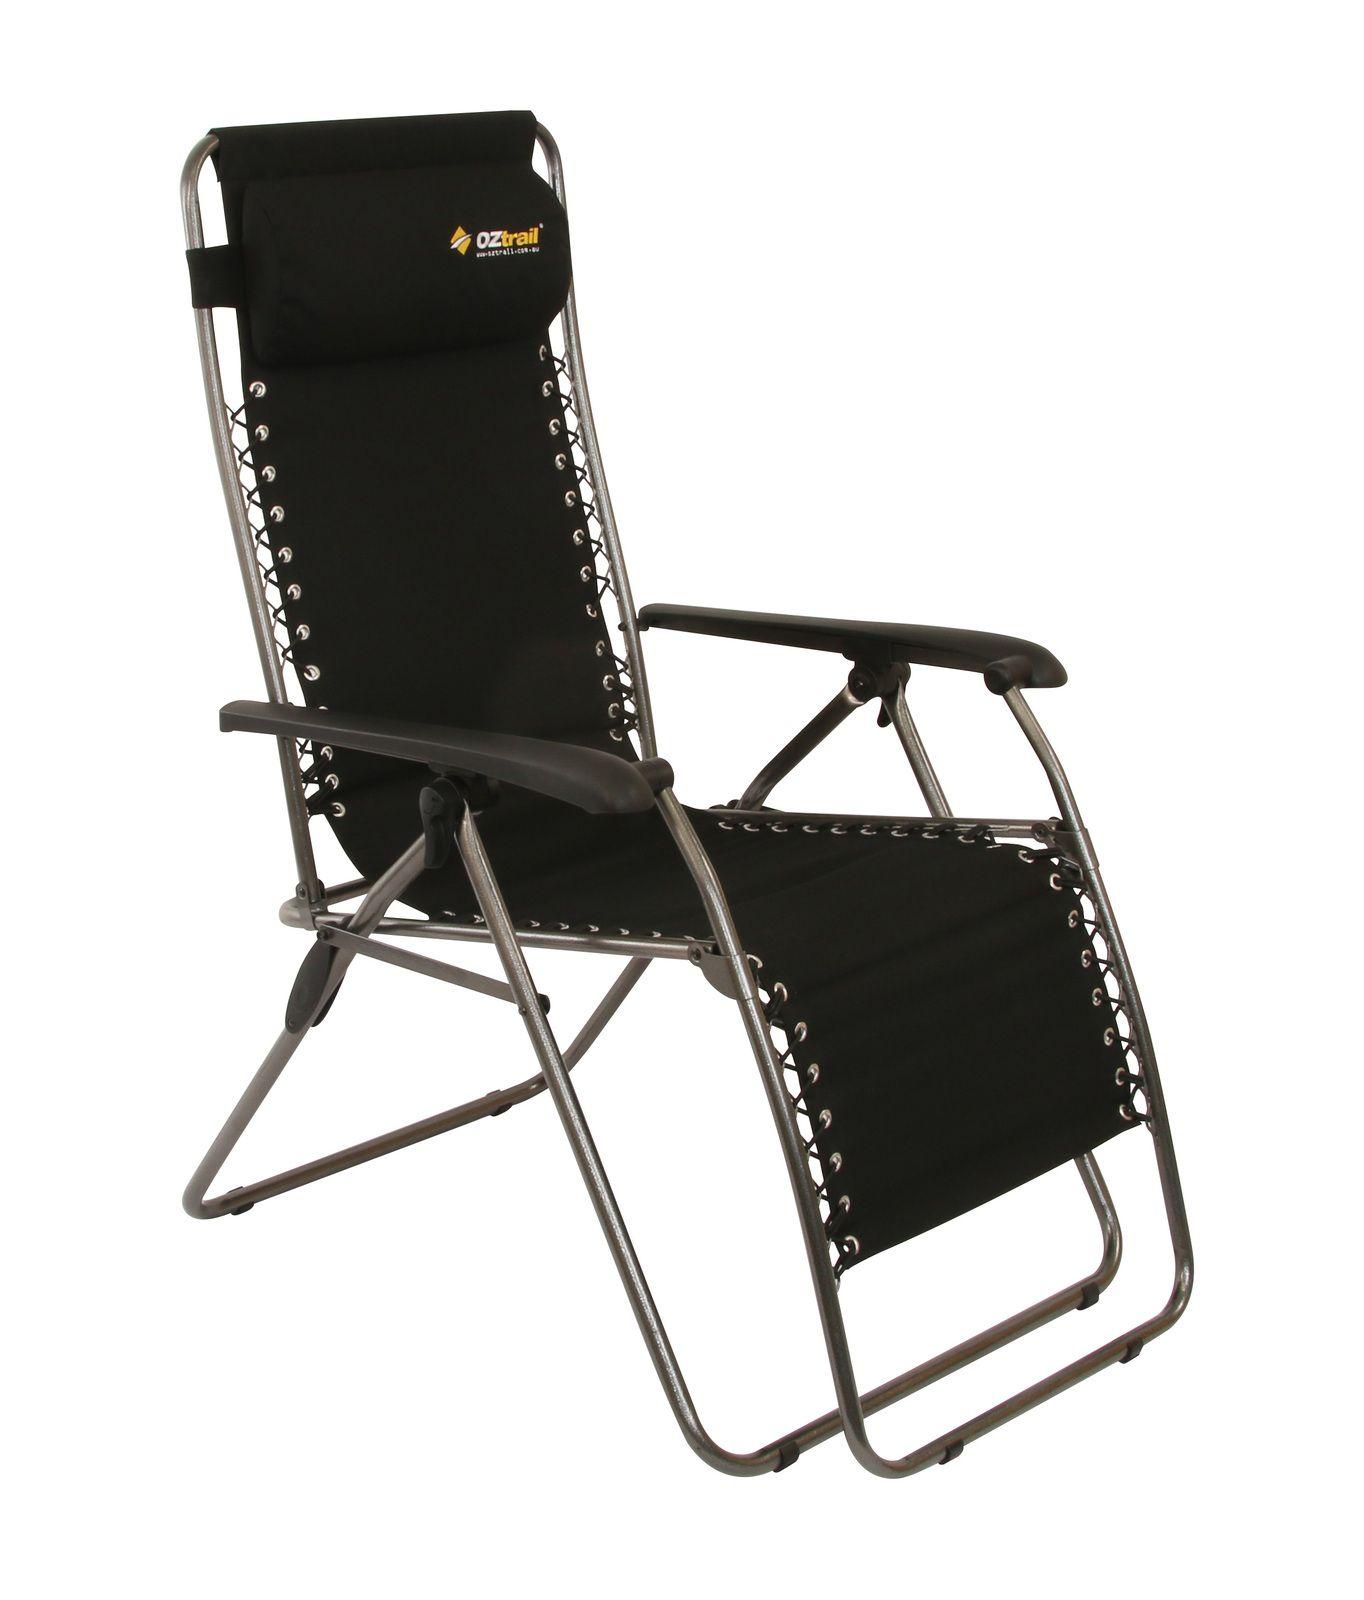 Klappstuhl Deckt Tragbare Picknick Stuhle Faltbare Picknick Stuhl